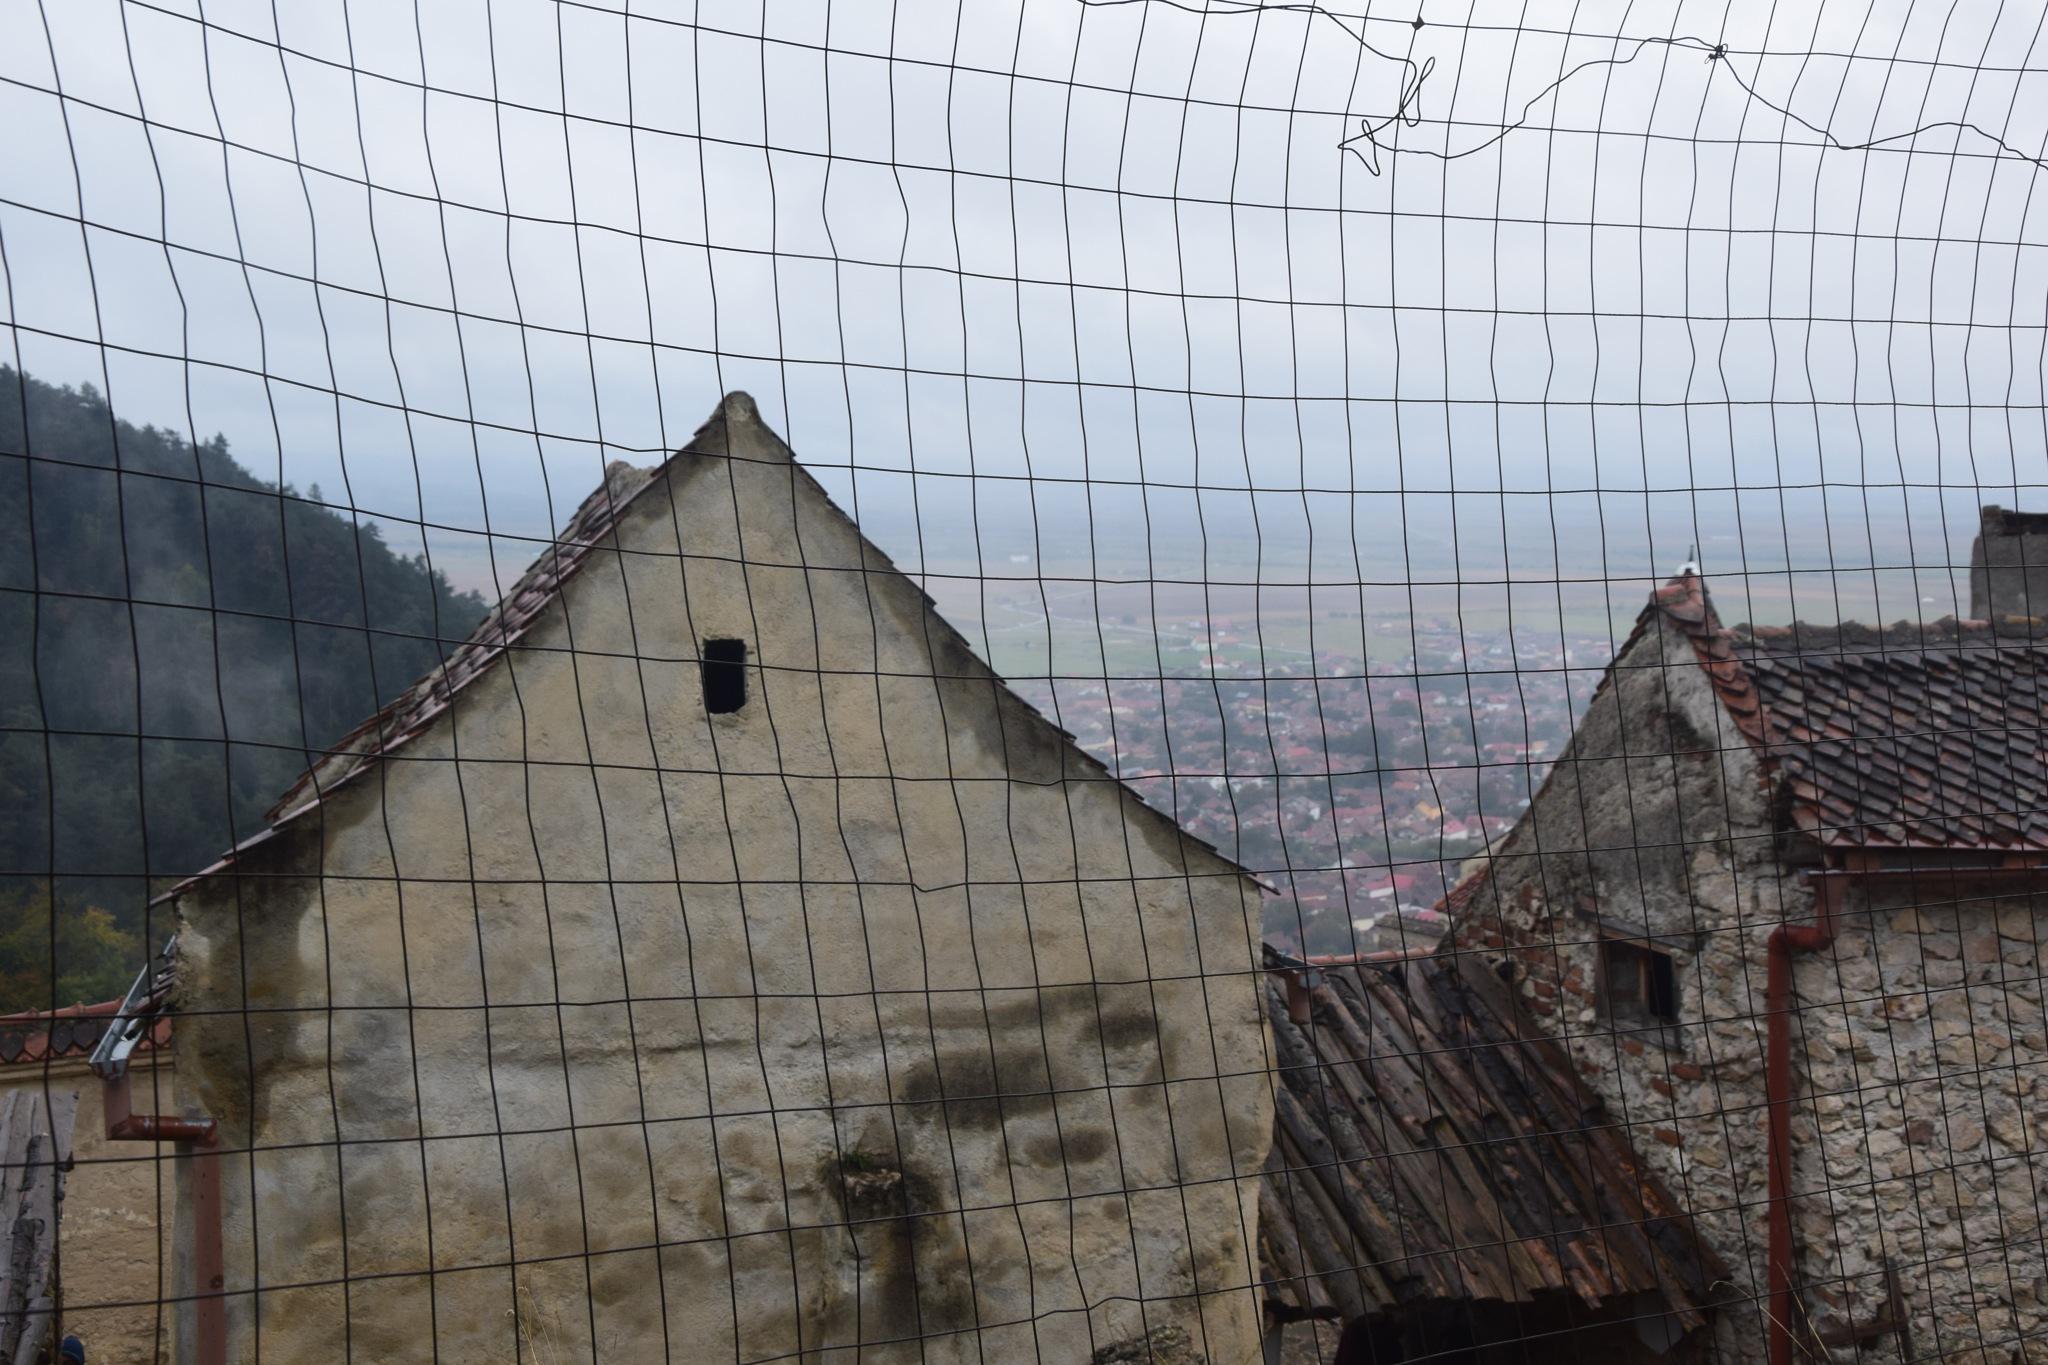 Rasnov Fortress 4 by GraemeLeePollard